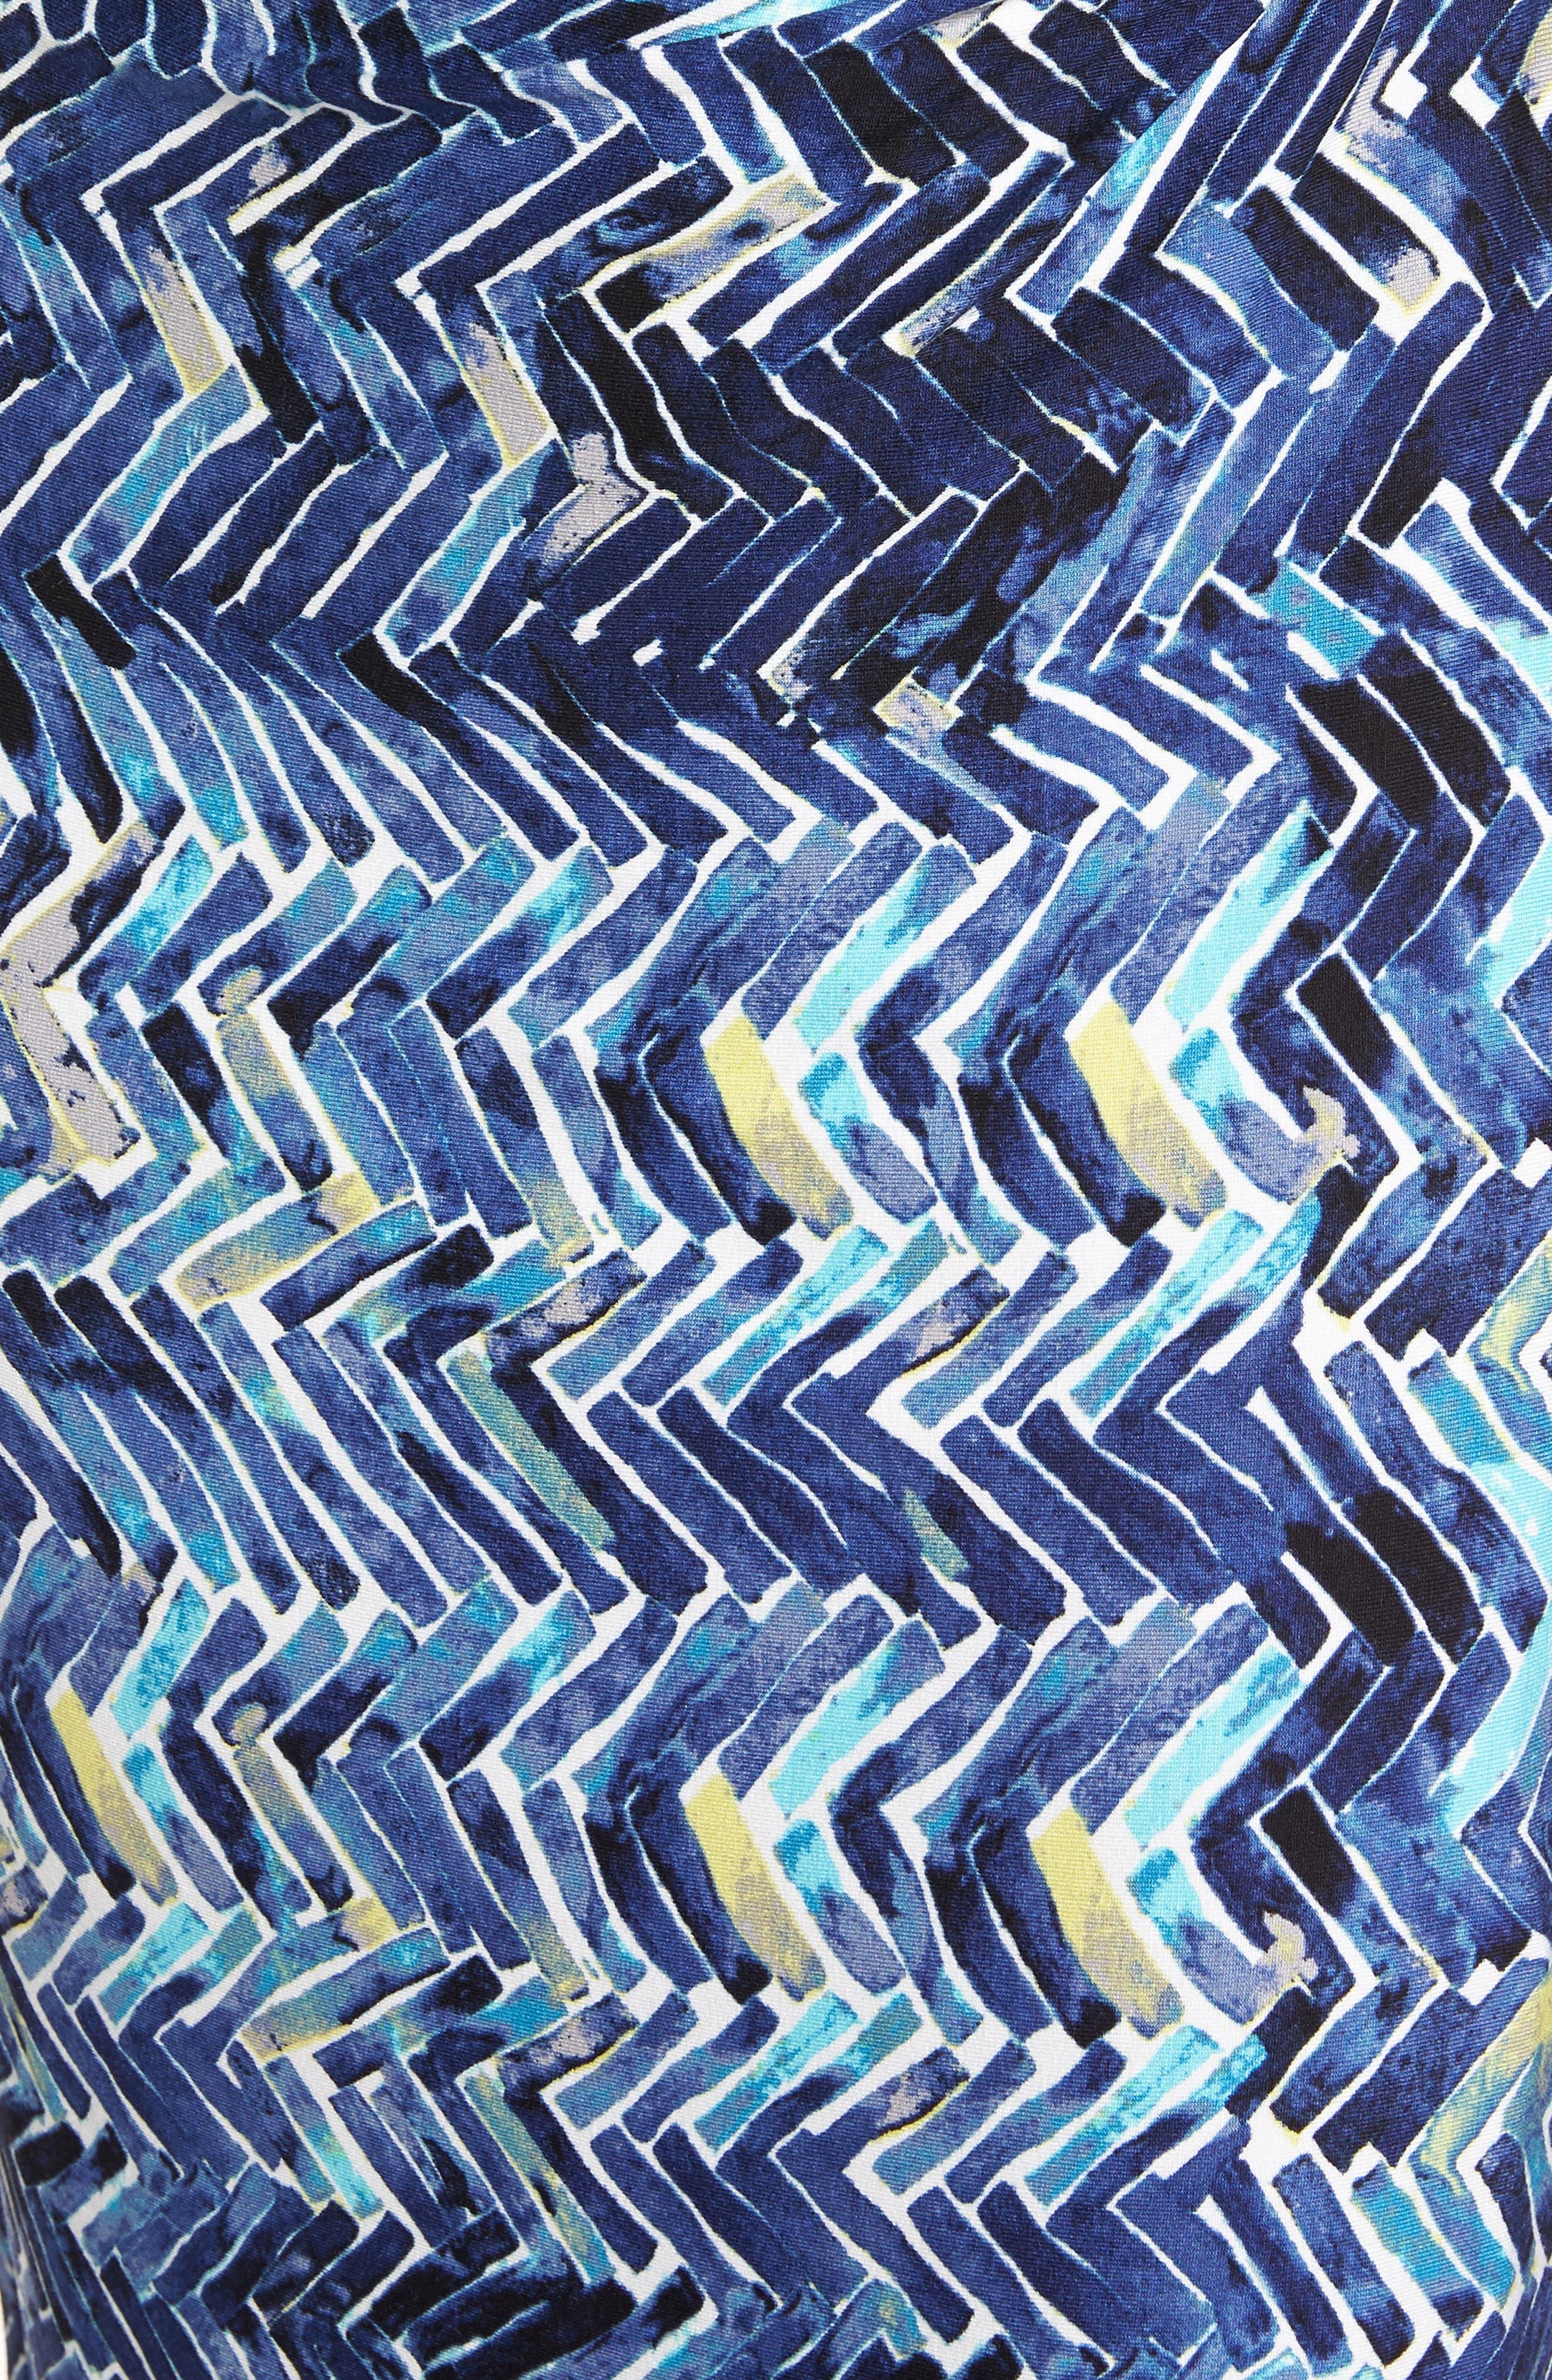 Seaside Tile Ruched Sheath Dress,                             Alternate thumbnail 5, color,                             Multi